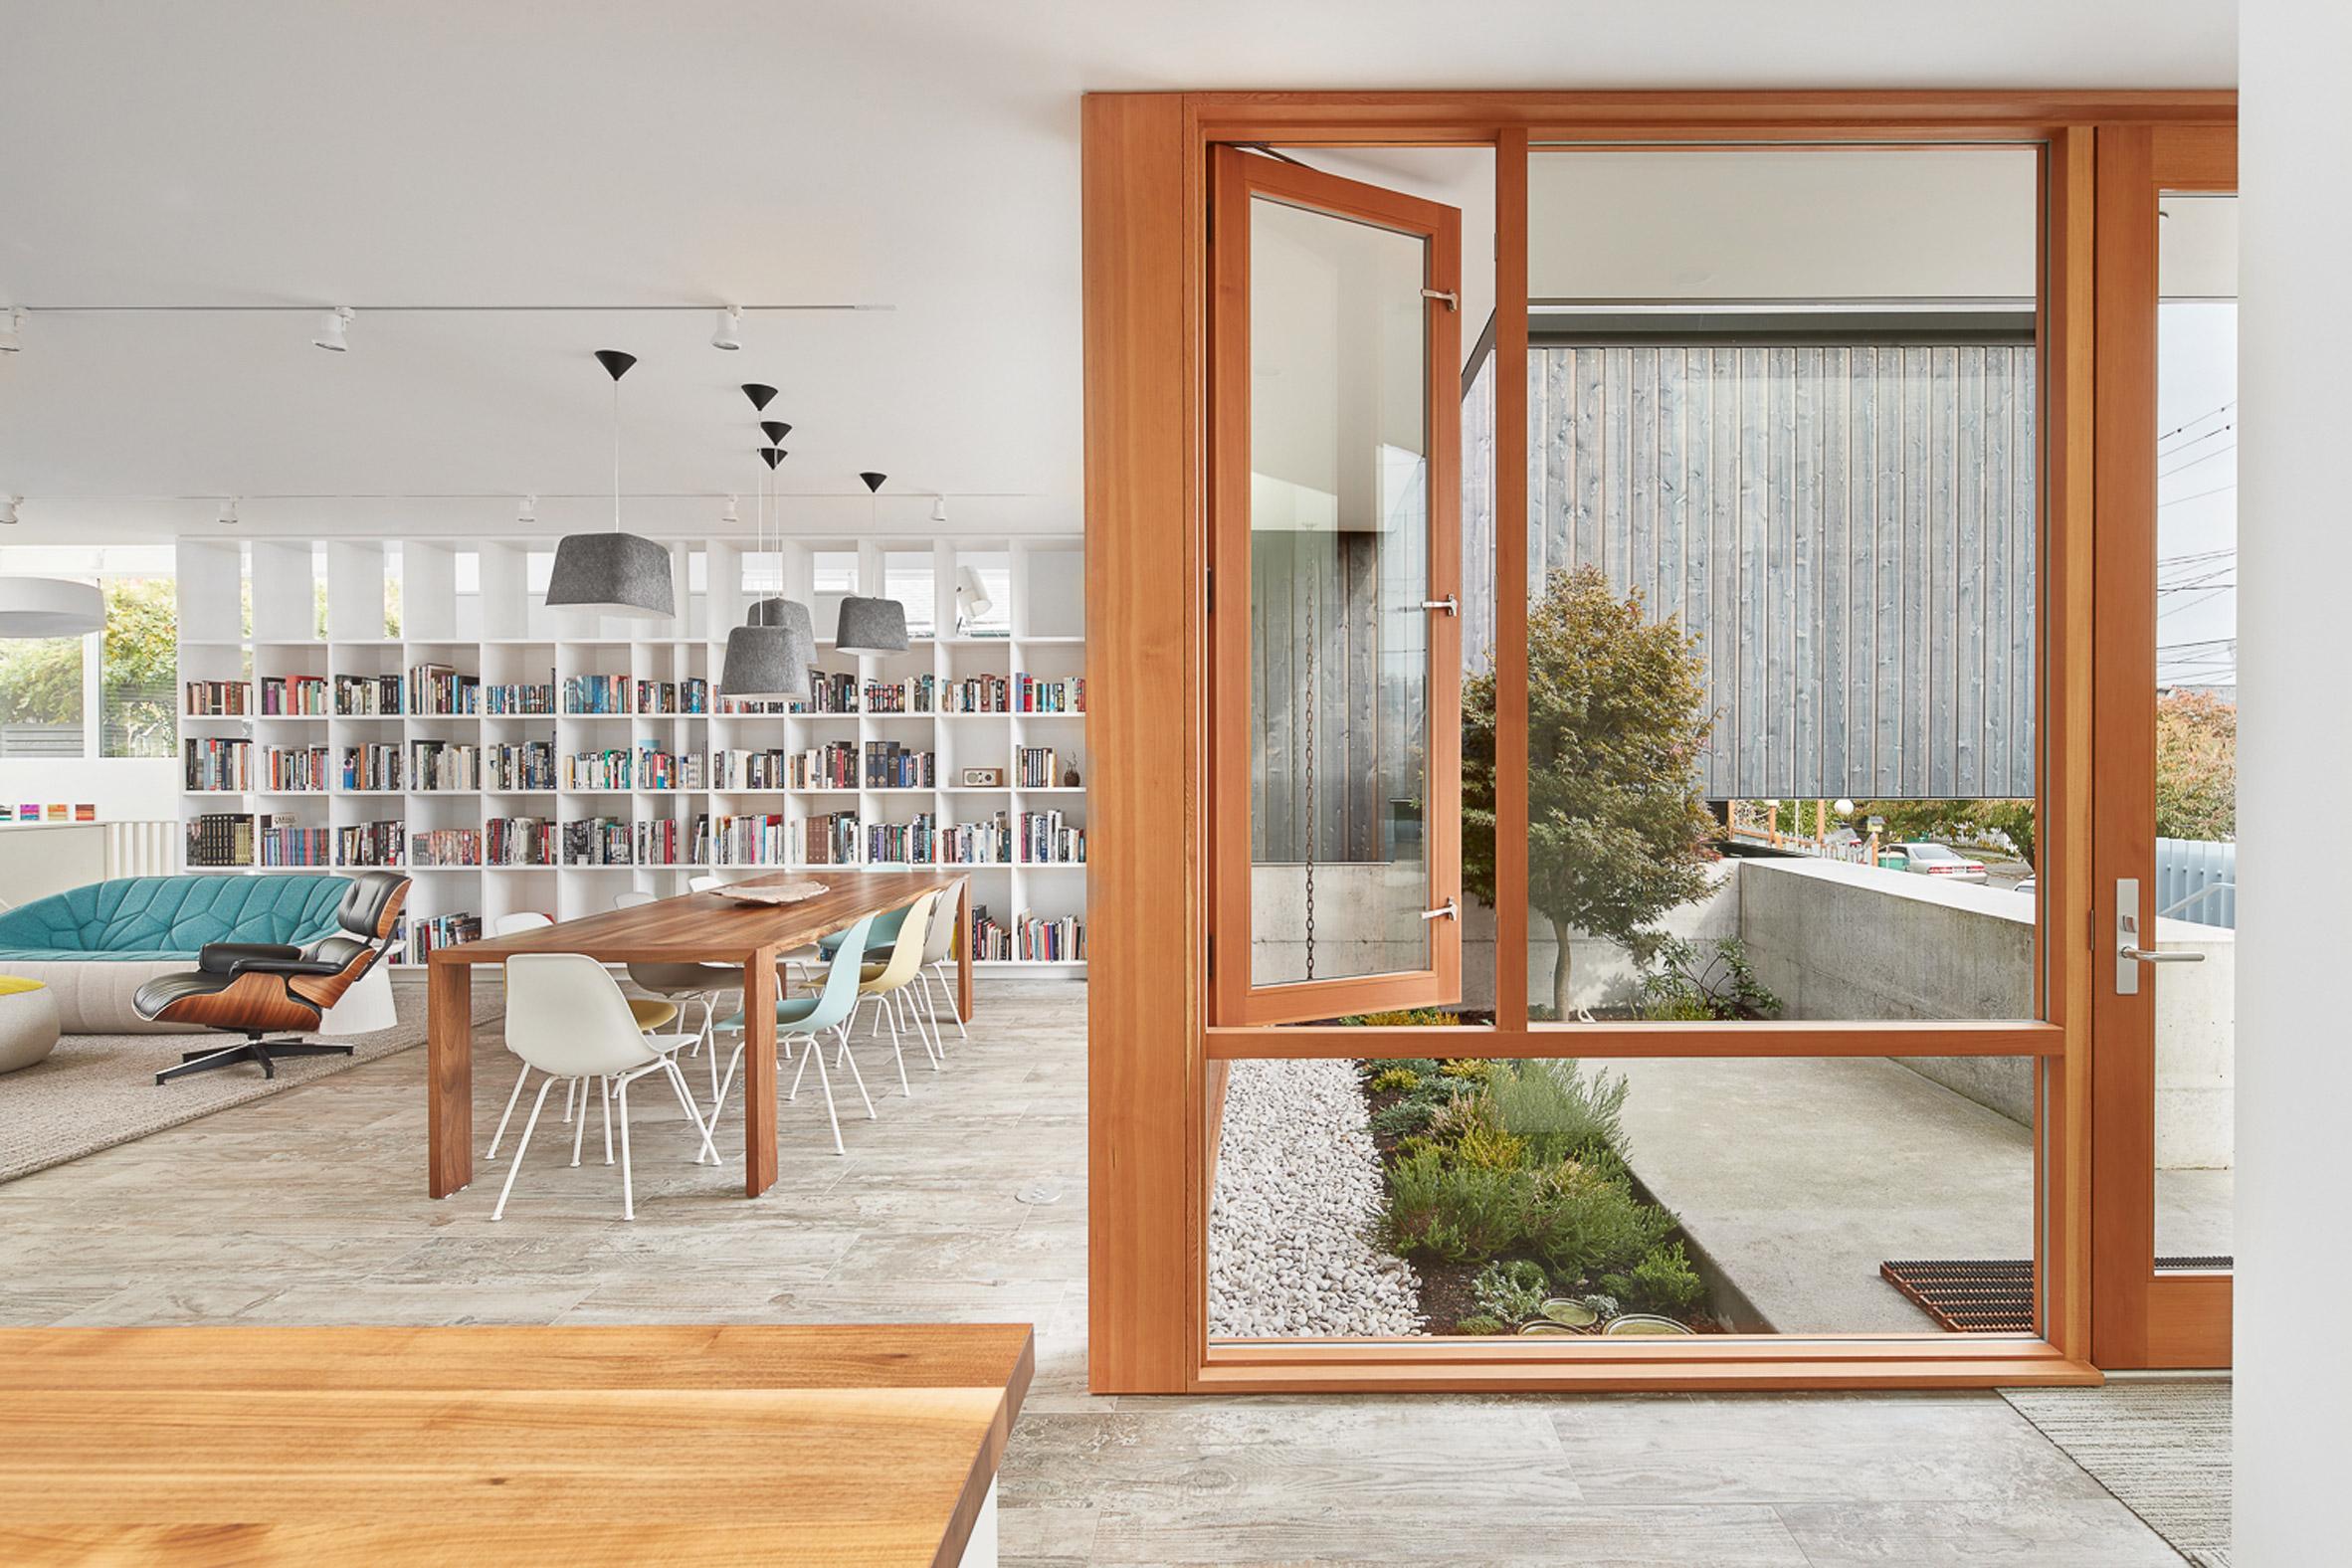 Heliotrope creates cedar-clad urban home and studio in Seattle